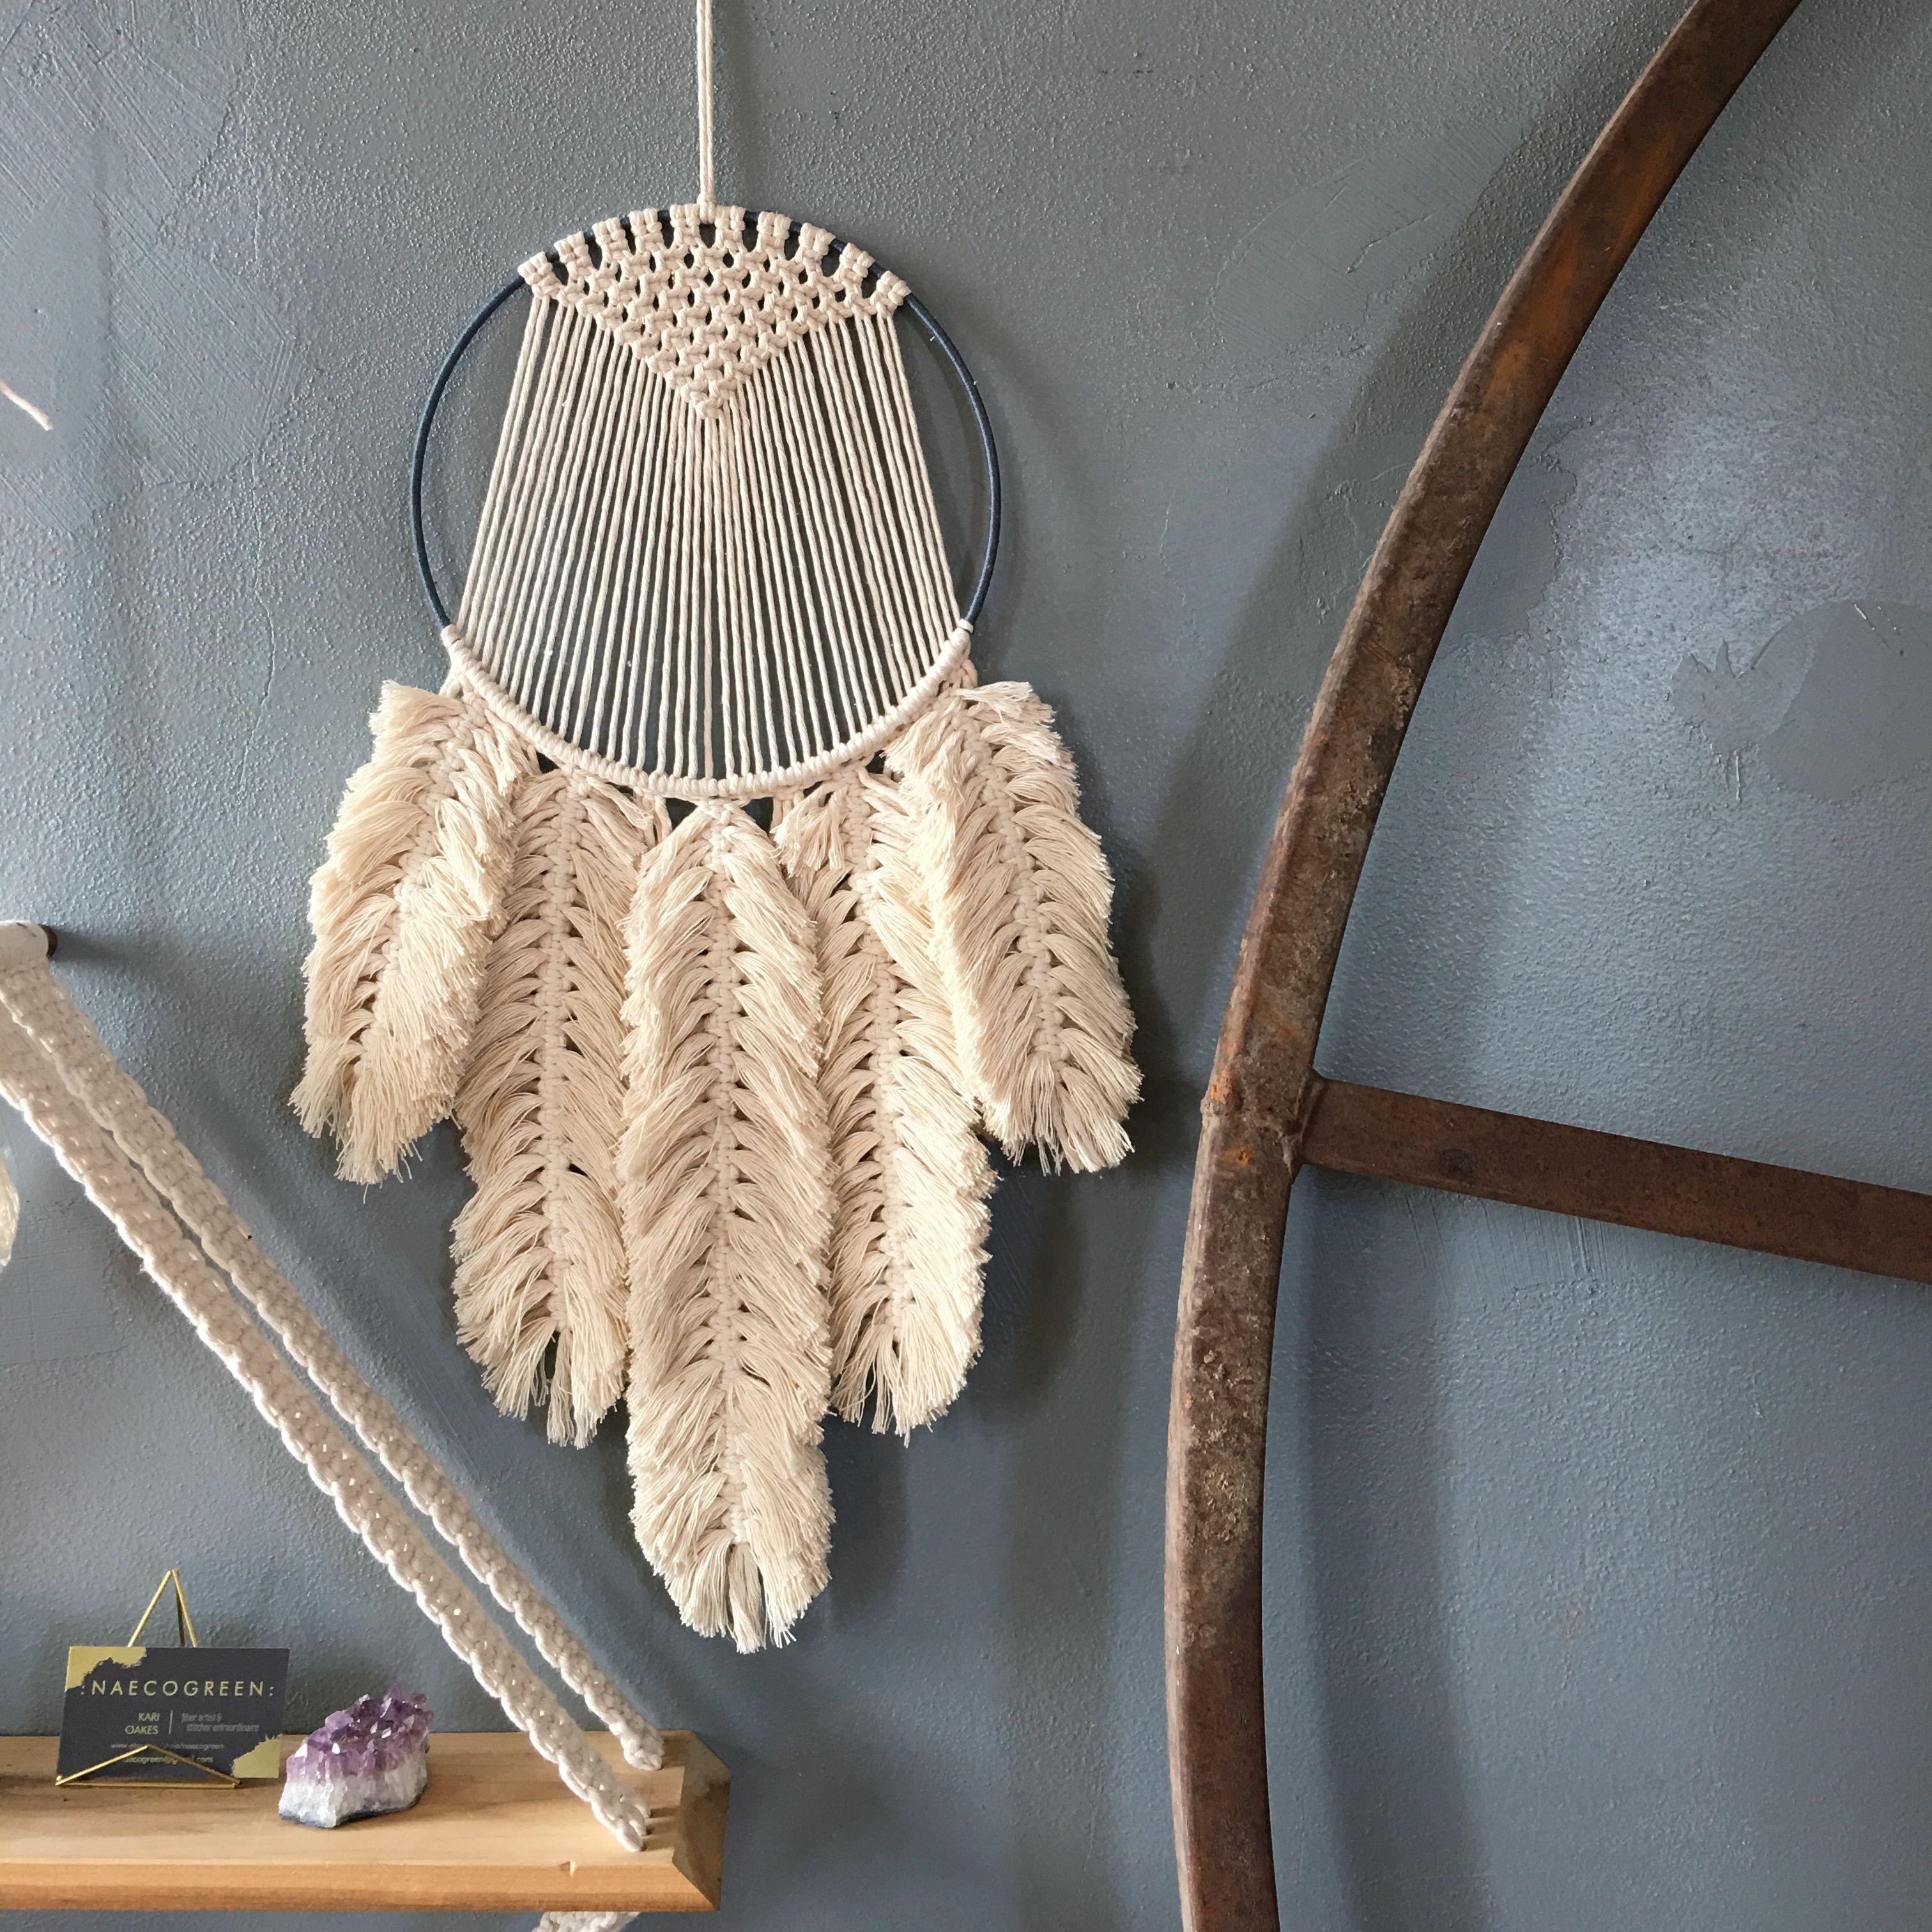 Macrame Feathers All Things Pretty Macrame Macrame